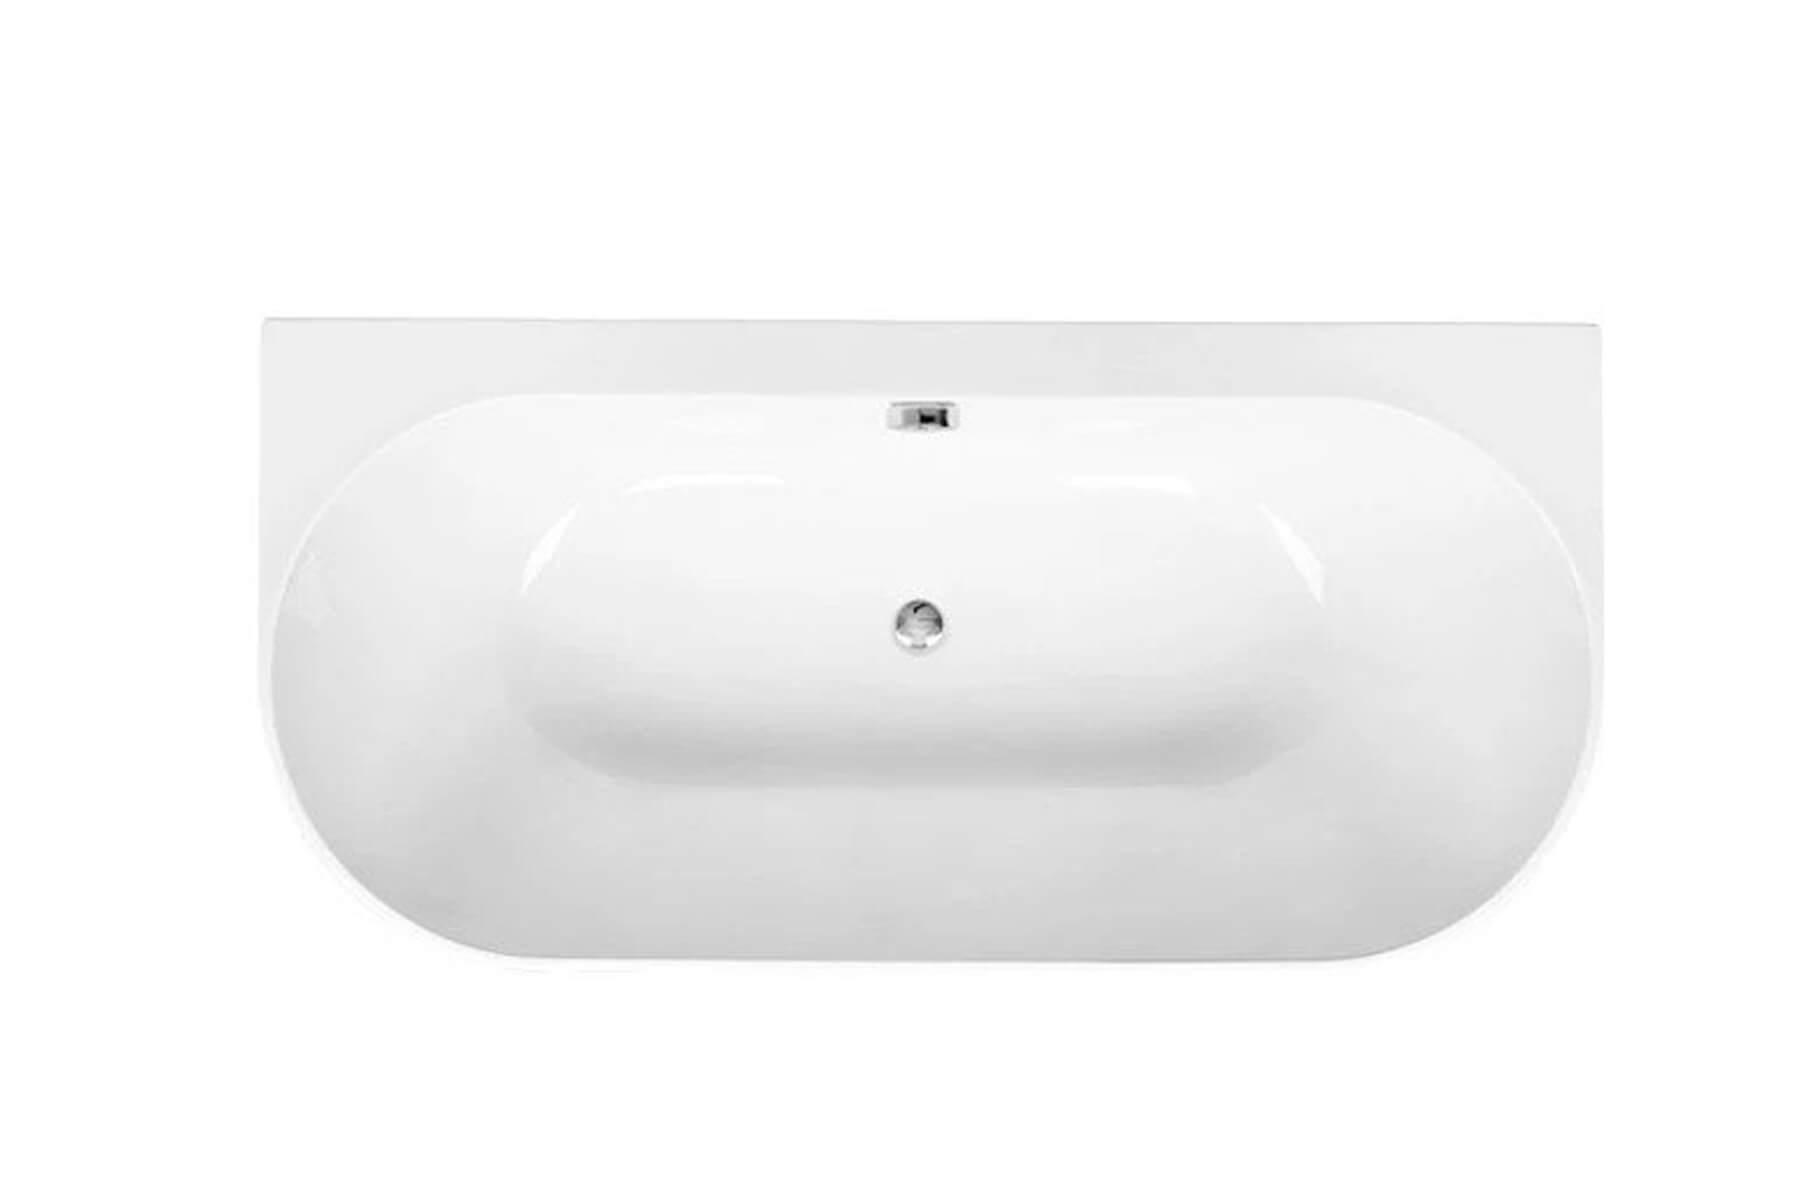 Bath-Tubs-WATERS-LOCHE-BTW-OVERHEAD-1800x1204